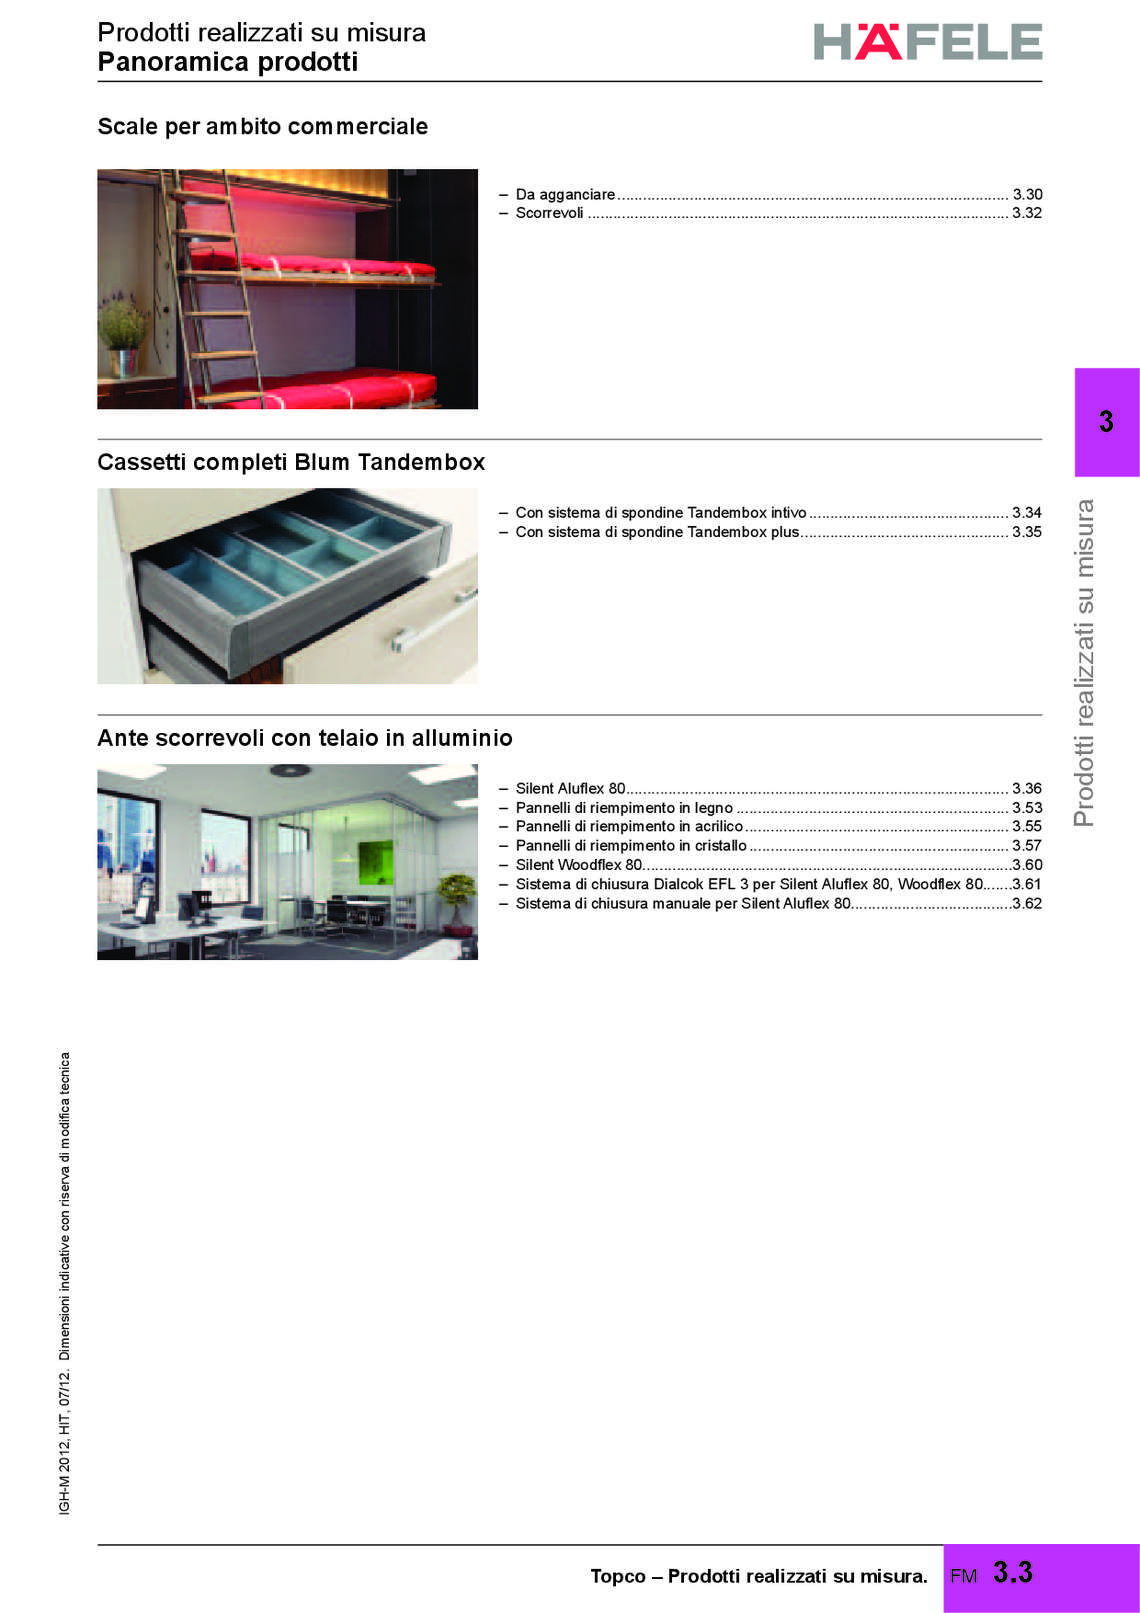 hafele-prodotti-su-misura_81_012.jpg